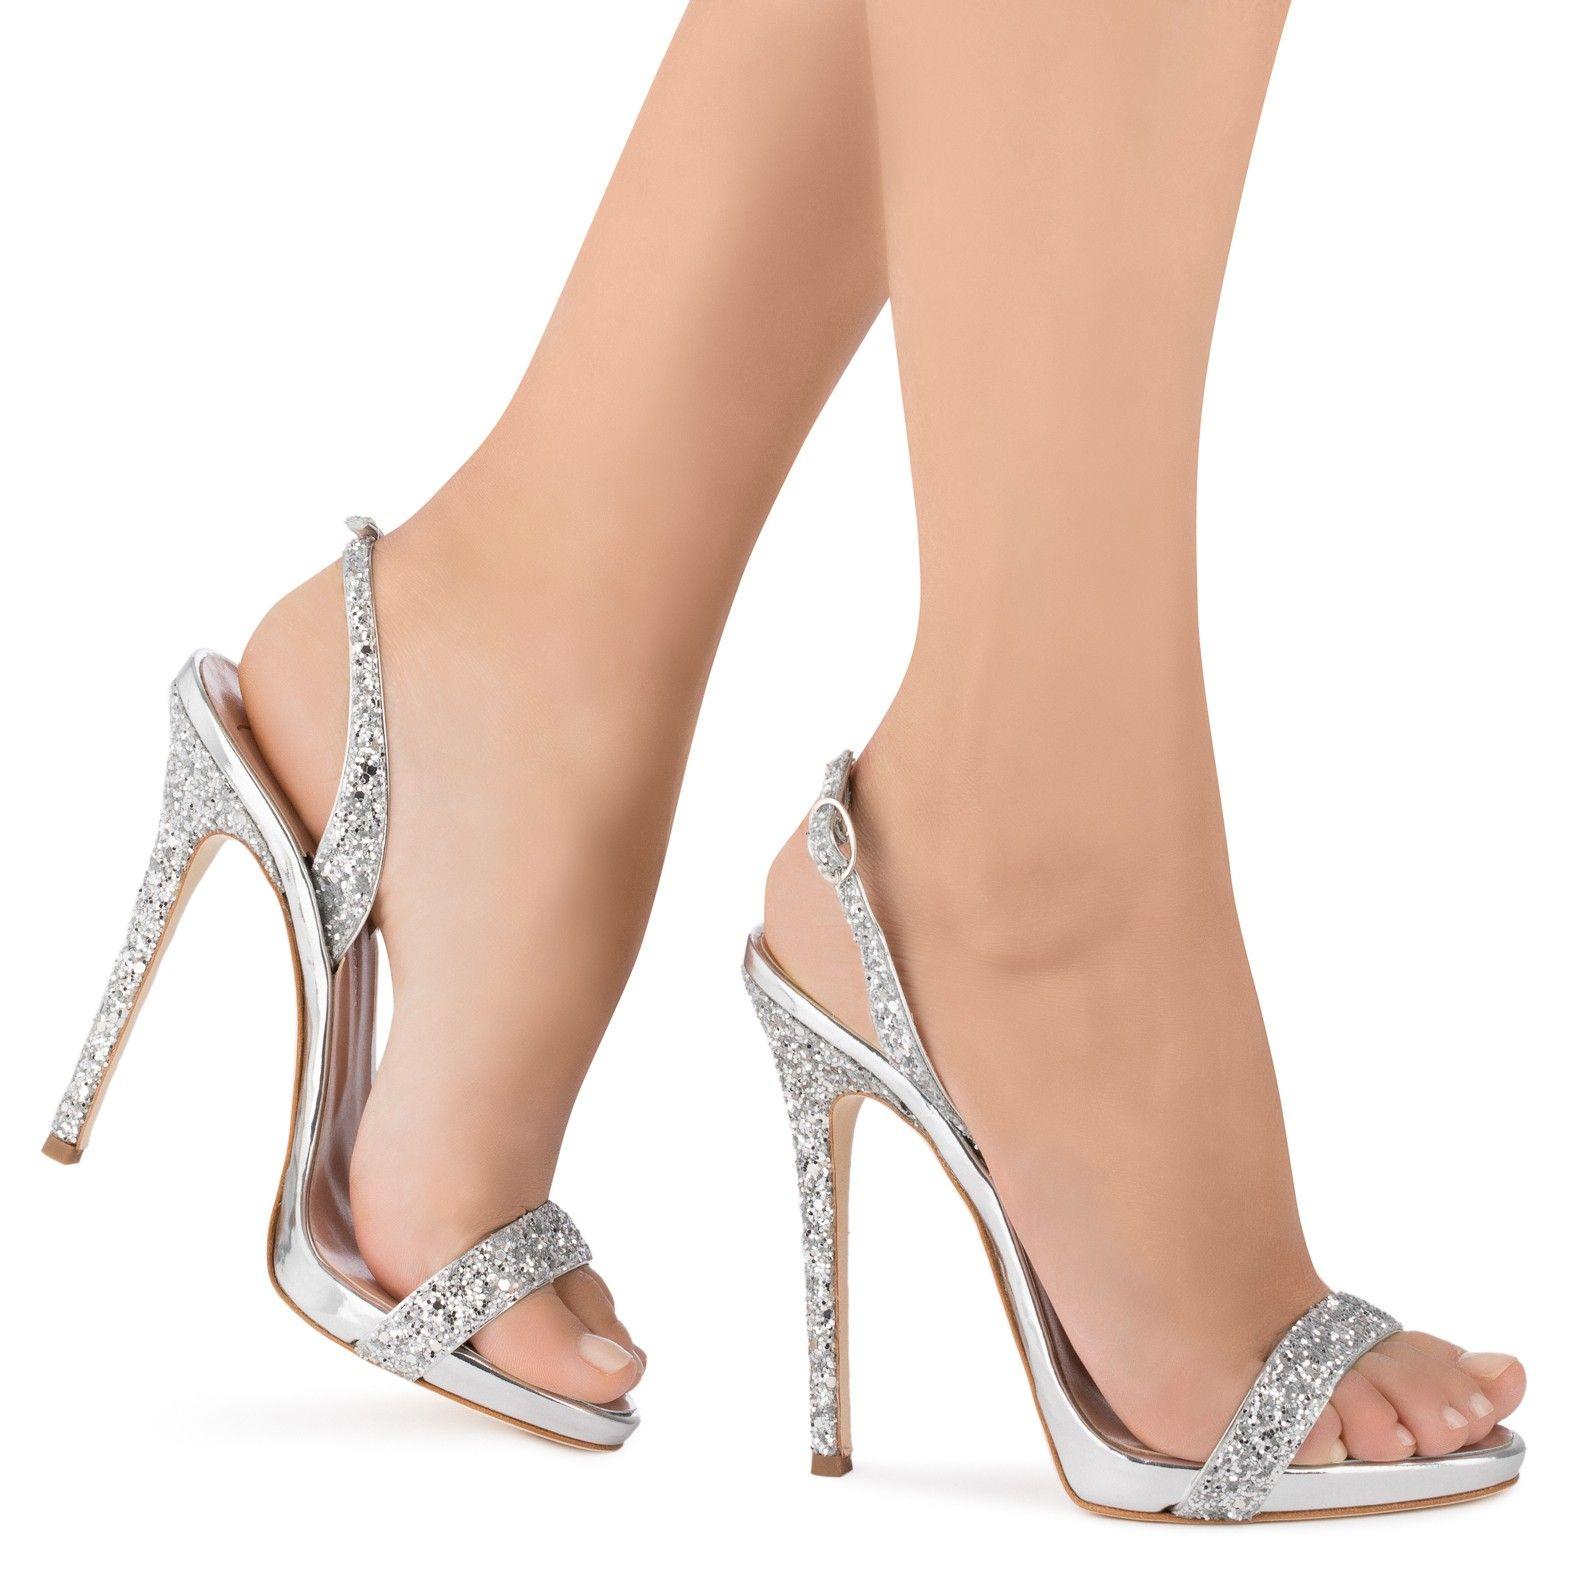 01325550f SOPHIE GLITTER - Sandals - SILVER - Giuseppe Zanotti